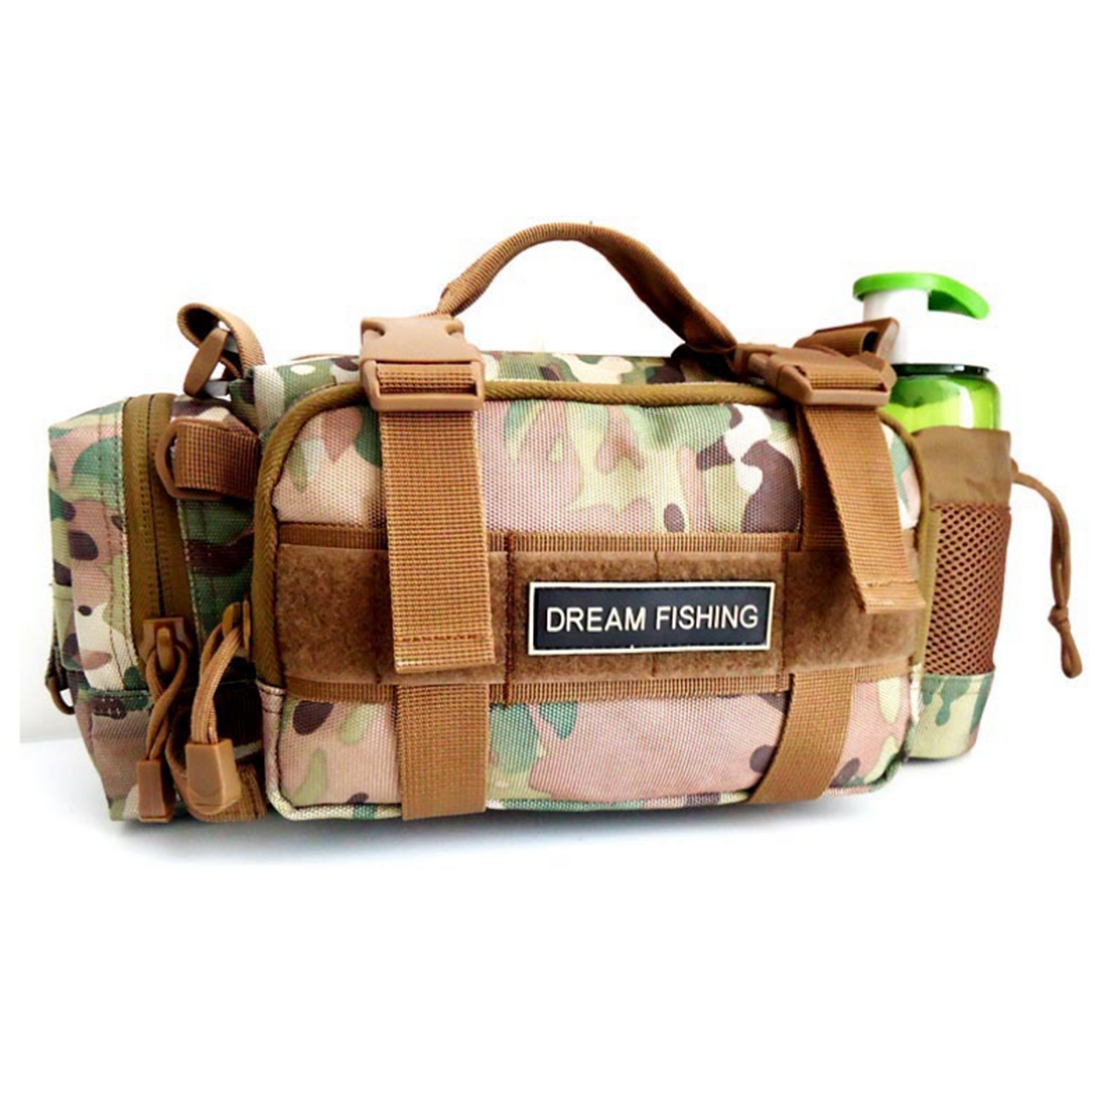 HIPSTEEN 2 Color Multi-Function Waist Bag Nylon Belt Bag For Travelling Mountaineering Satchel 35* 13* 16cm makino multi functional water resistant outdoor mountaineering nylon waist bag deep pink 6l